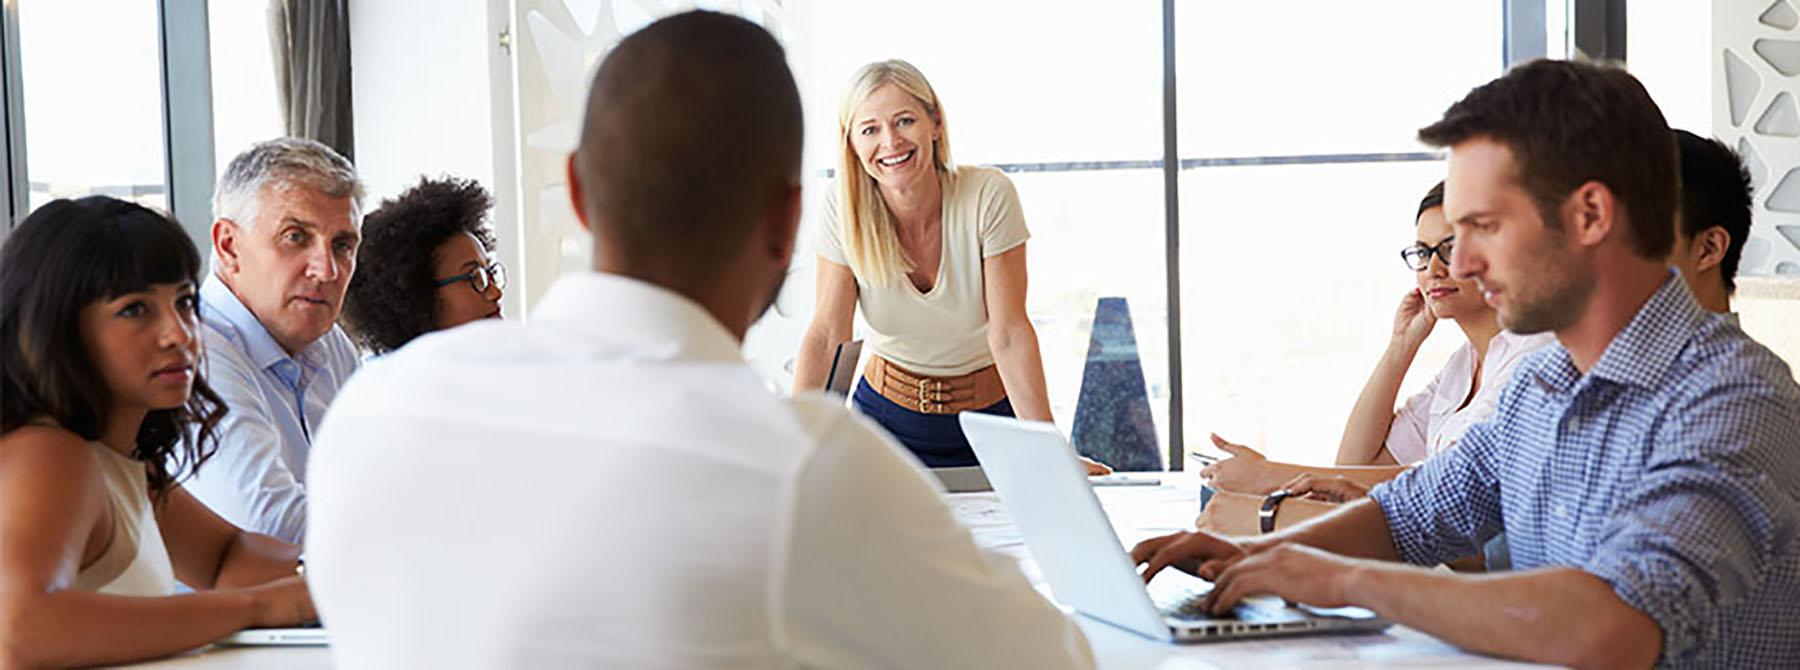 A company meeting